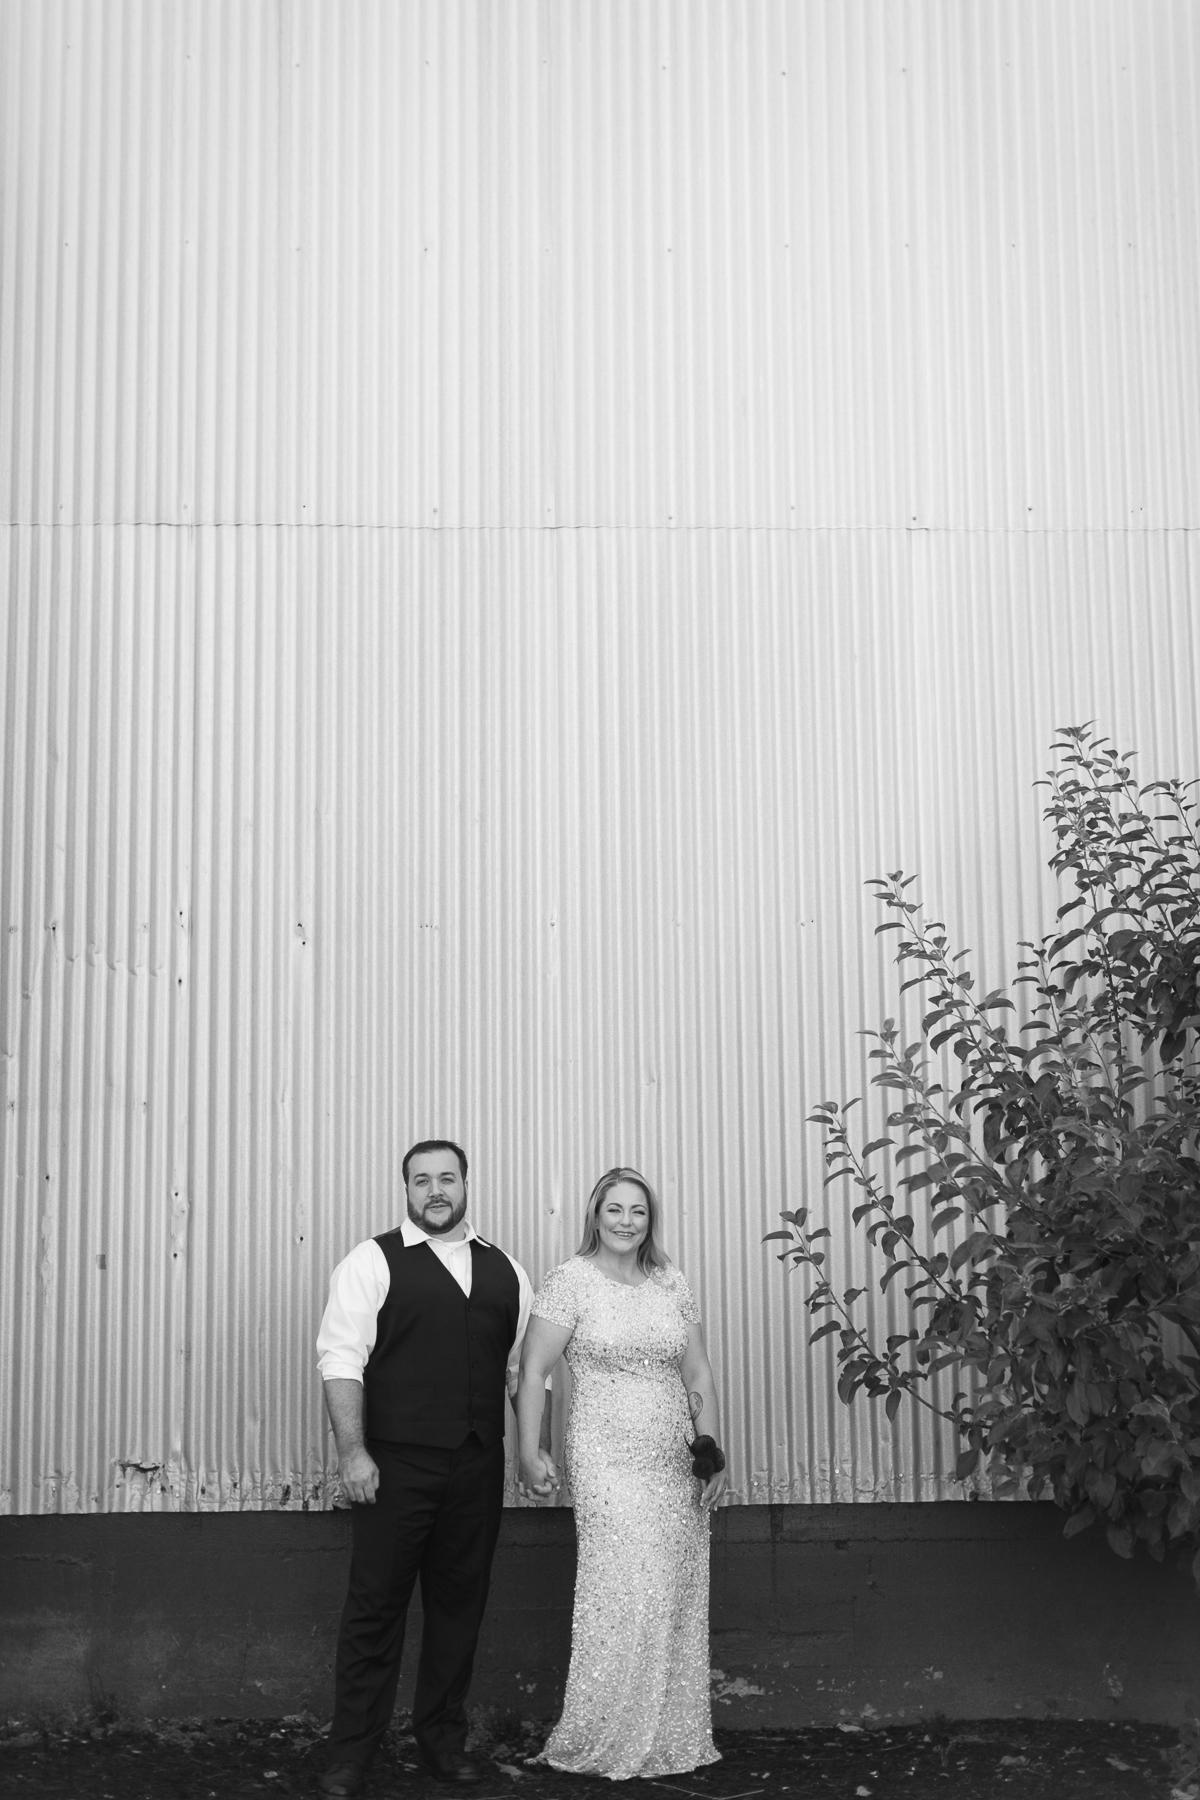 Sebastopol Barlow Wedding Photography Maria Villano-2.jpg